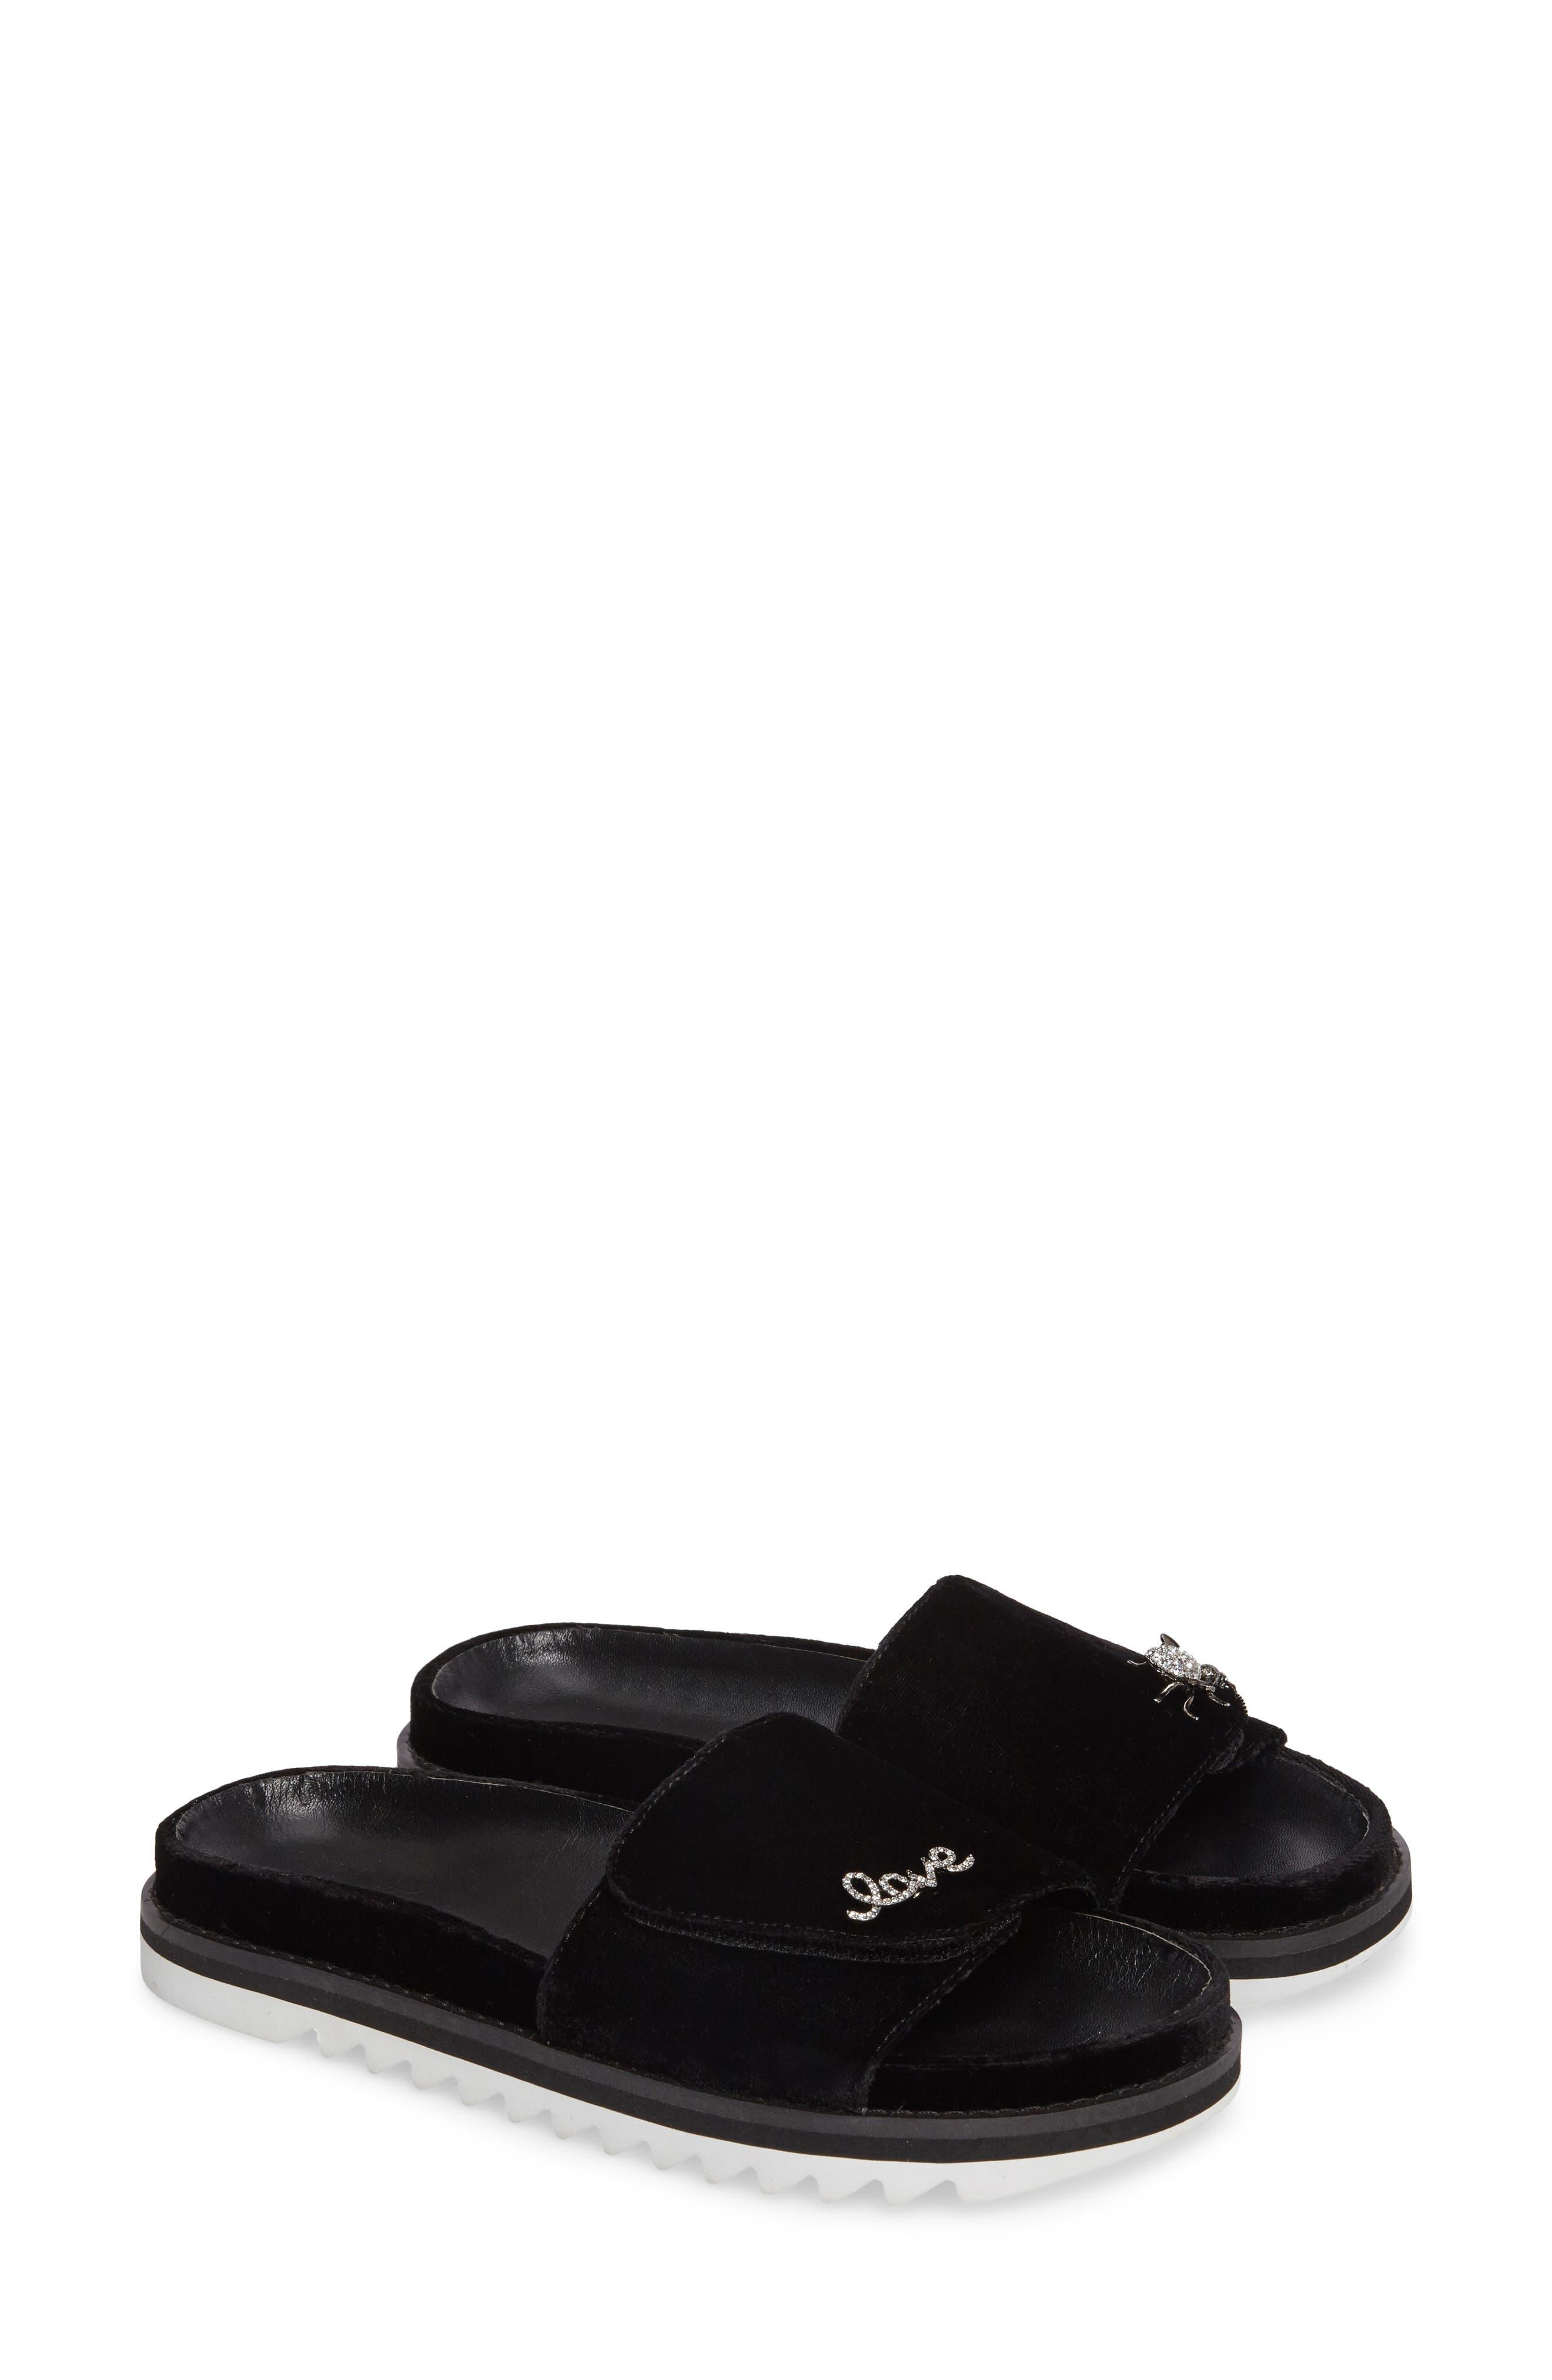 Jacinda Slide Sandal,                         Main,                         color, 001